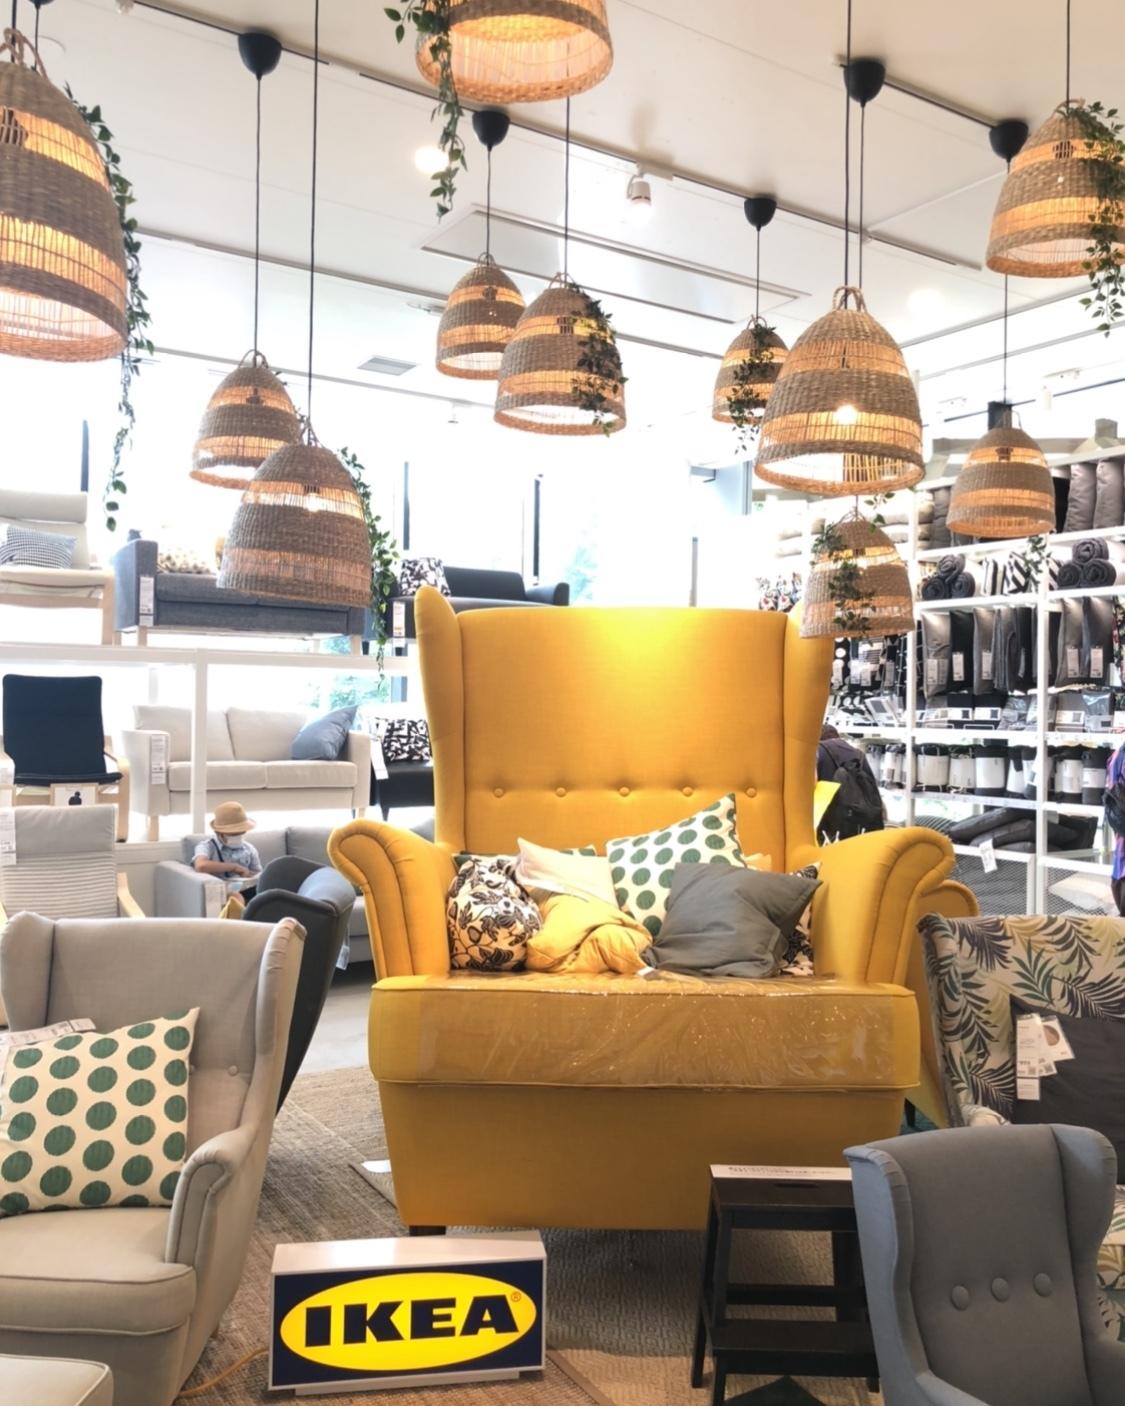 IKEA原宿プレオープンへ行ってきました_1_5-2